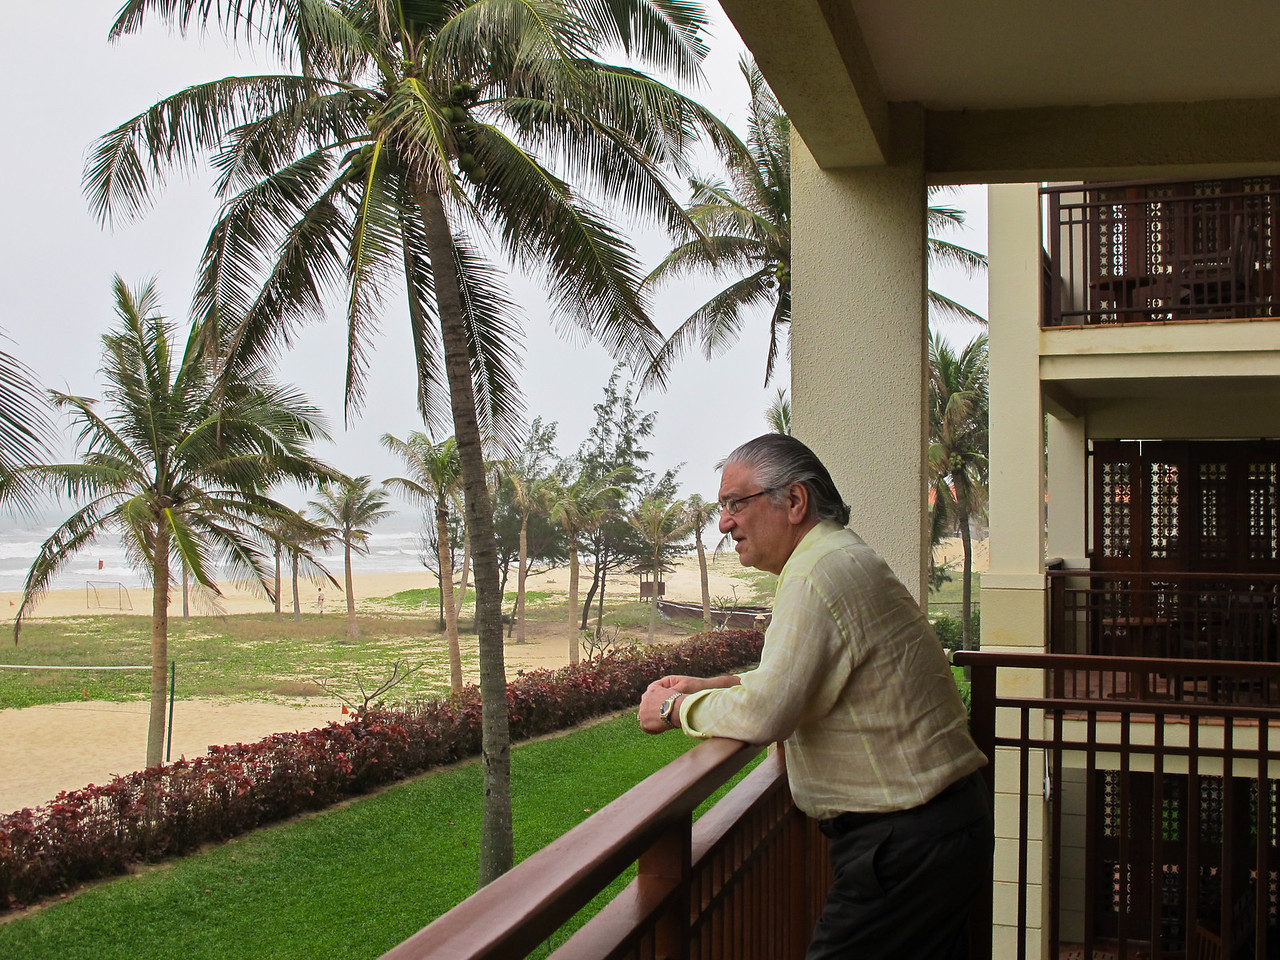 David Minker at China Beach, Danang, Vietnam